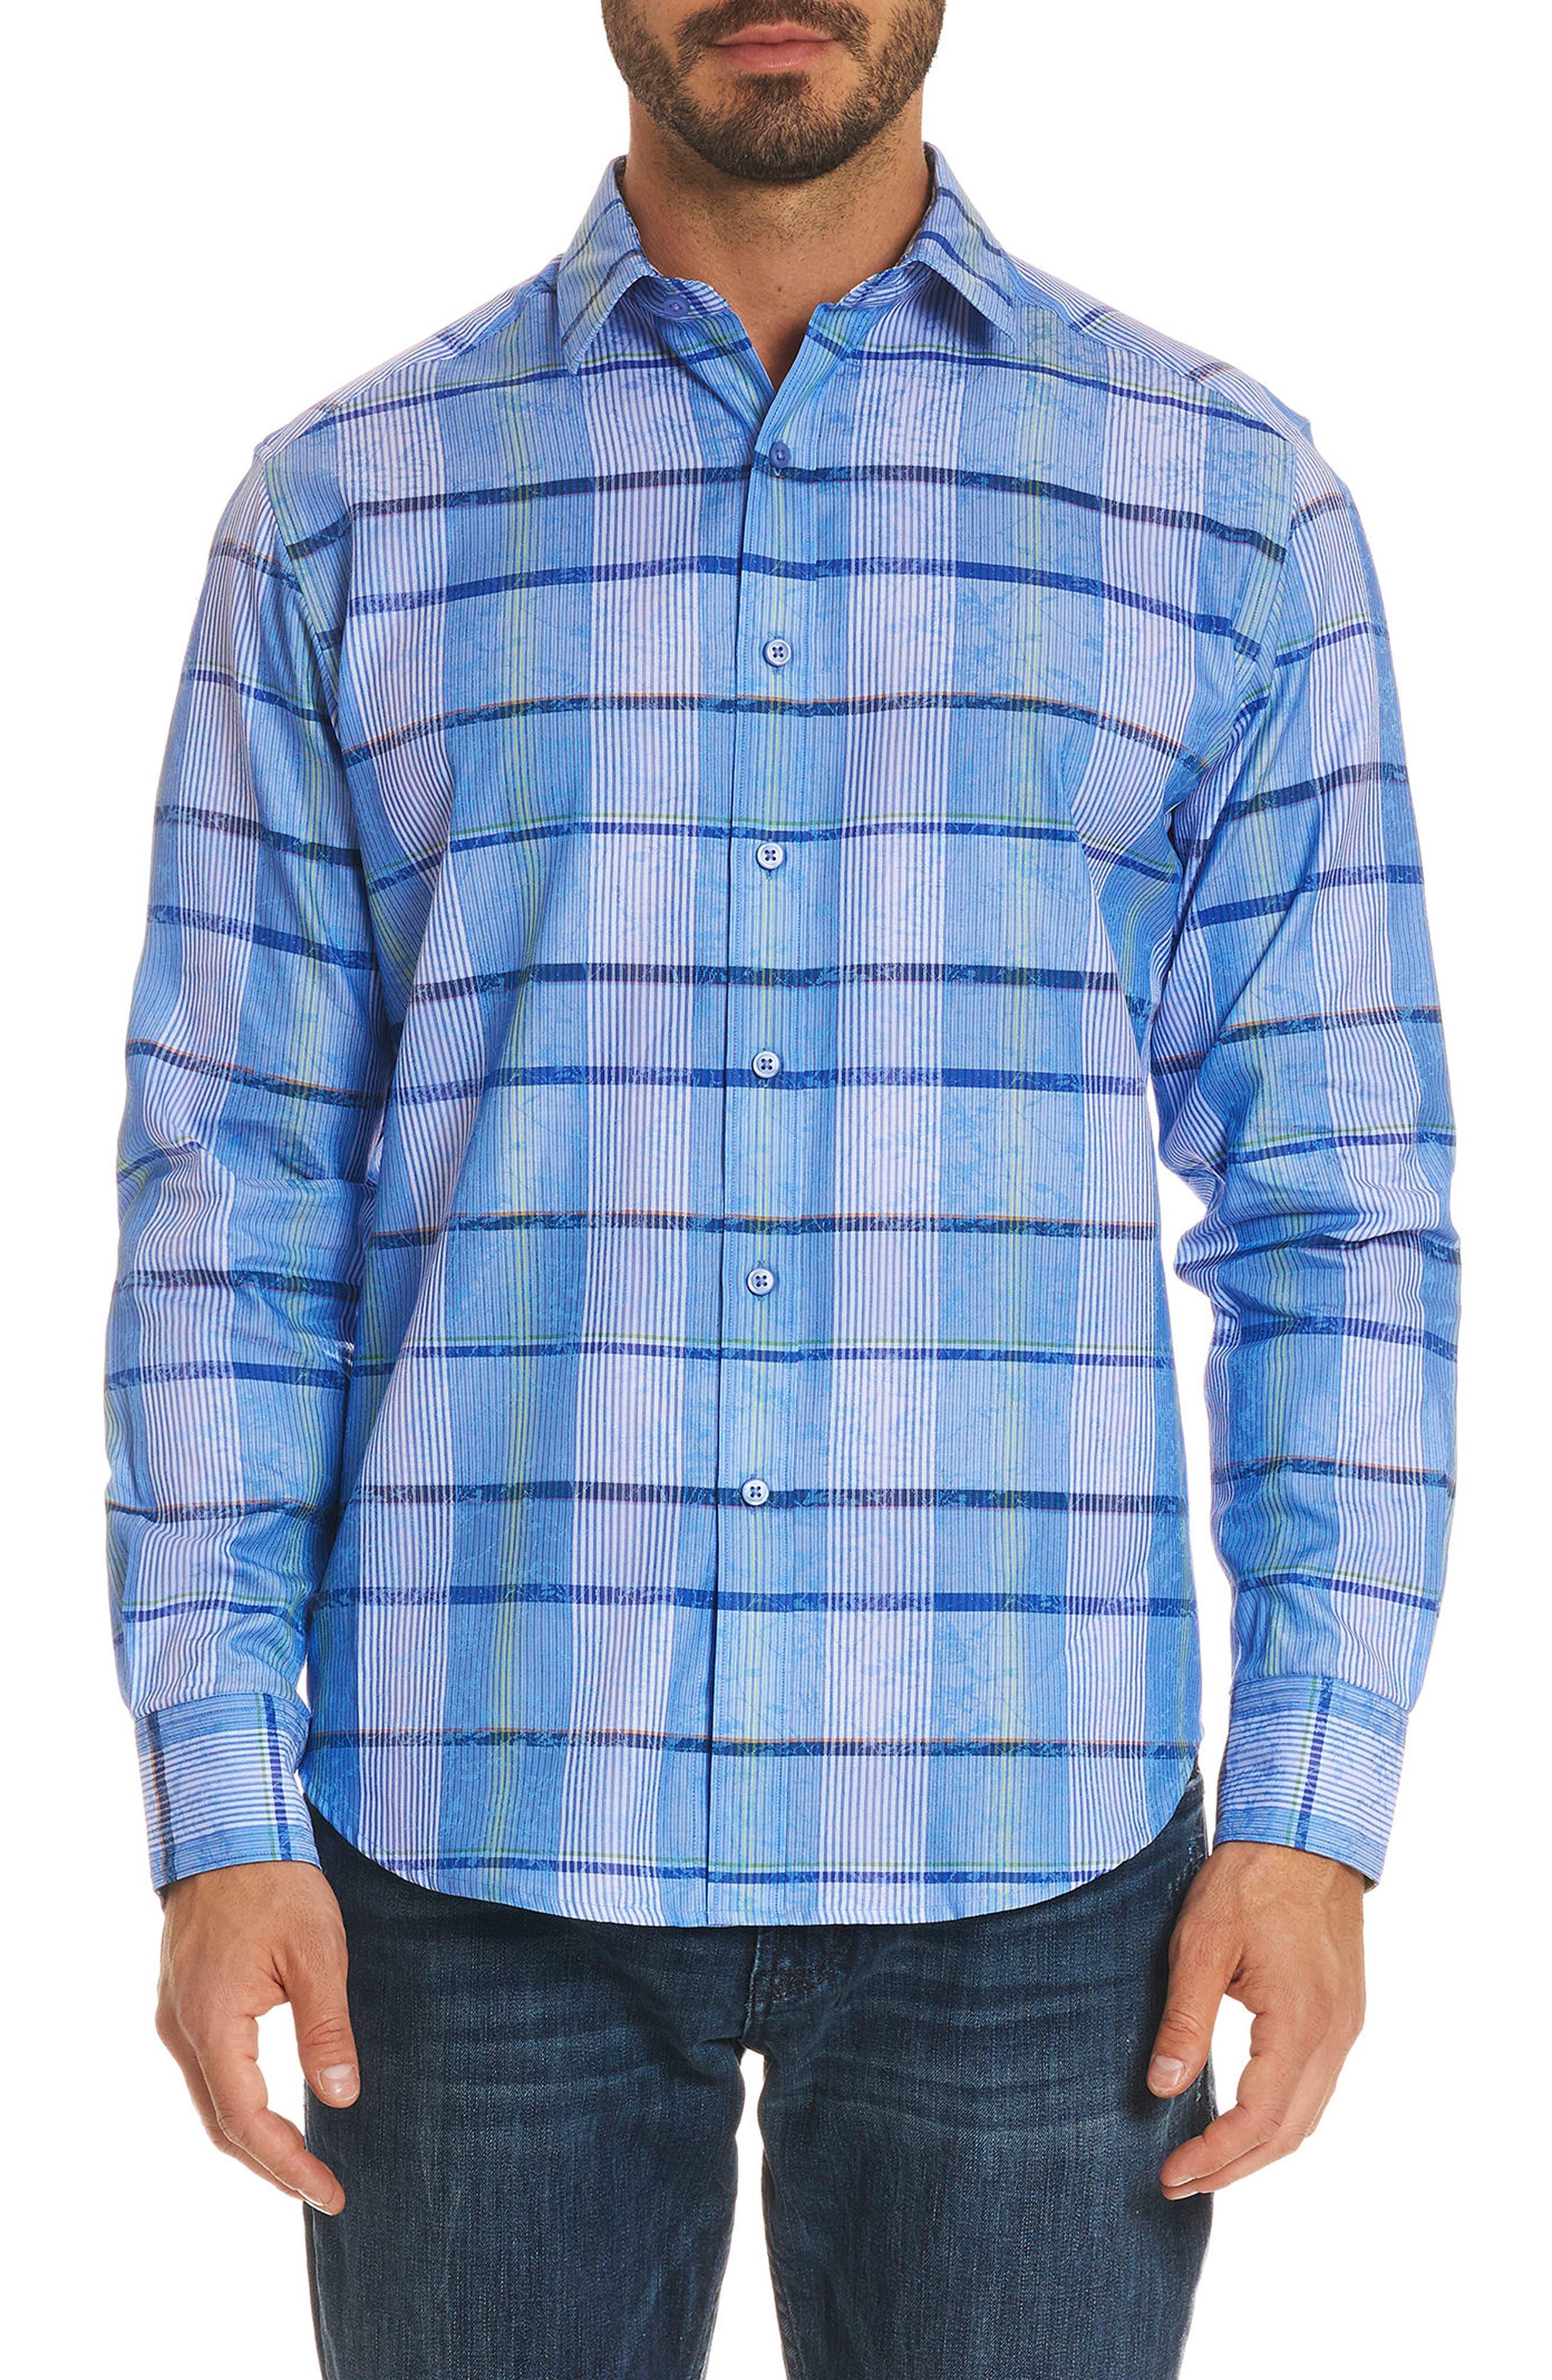 Ferro Classic Fit Sport Shirt,                         Main,                         color, Blue